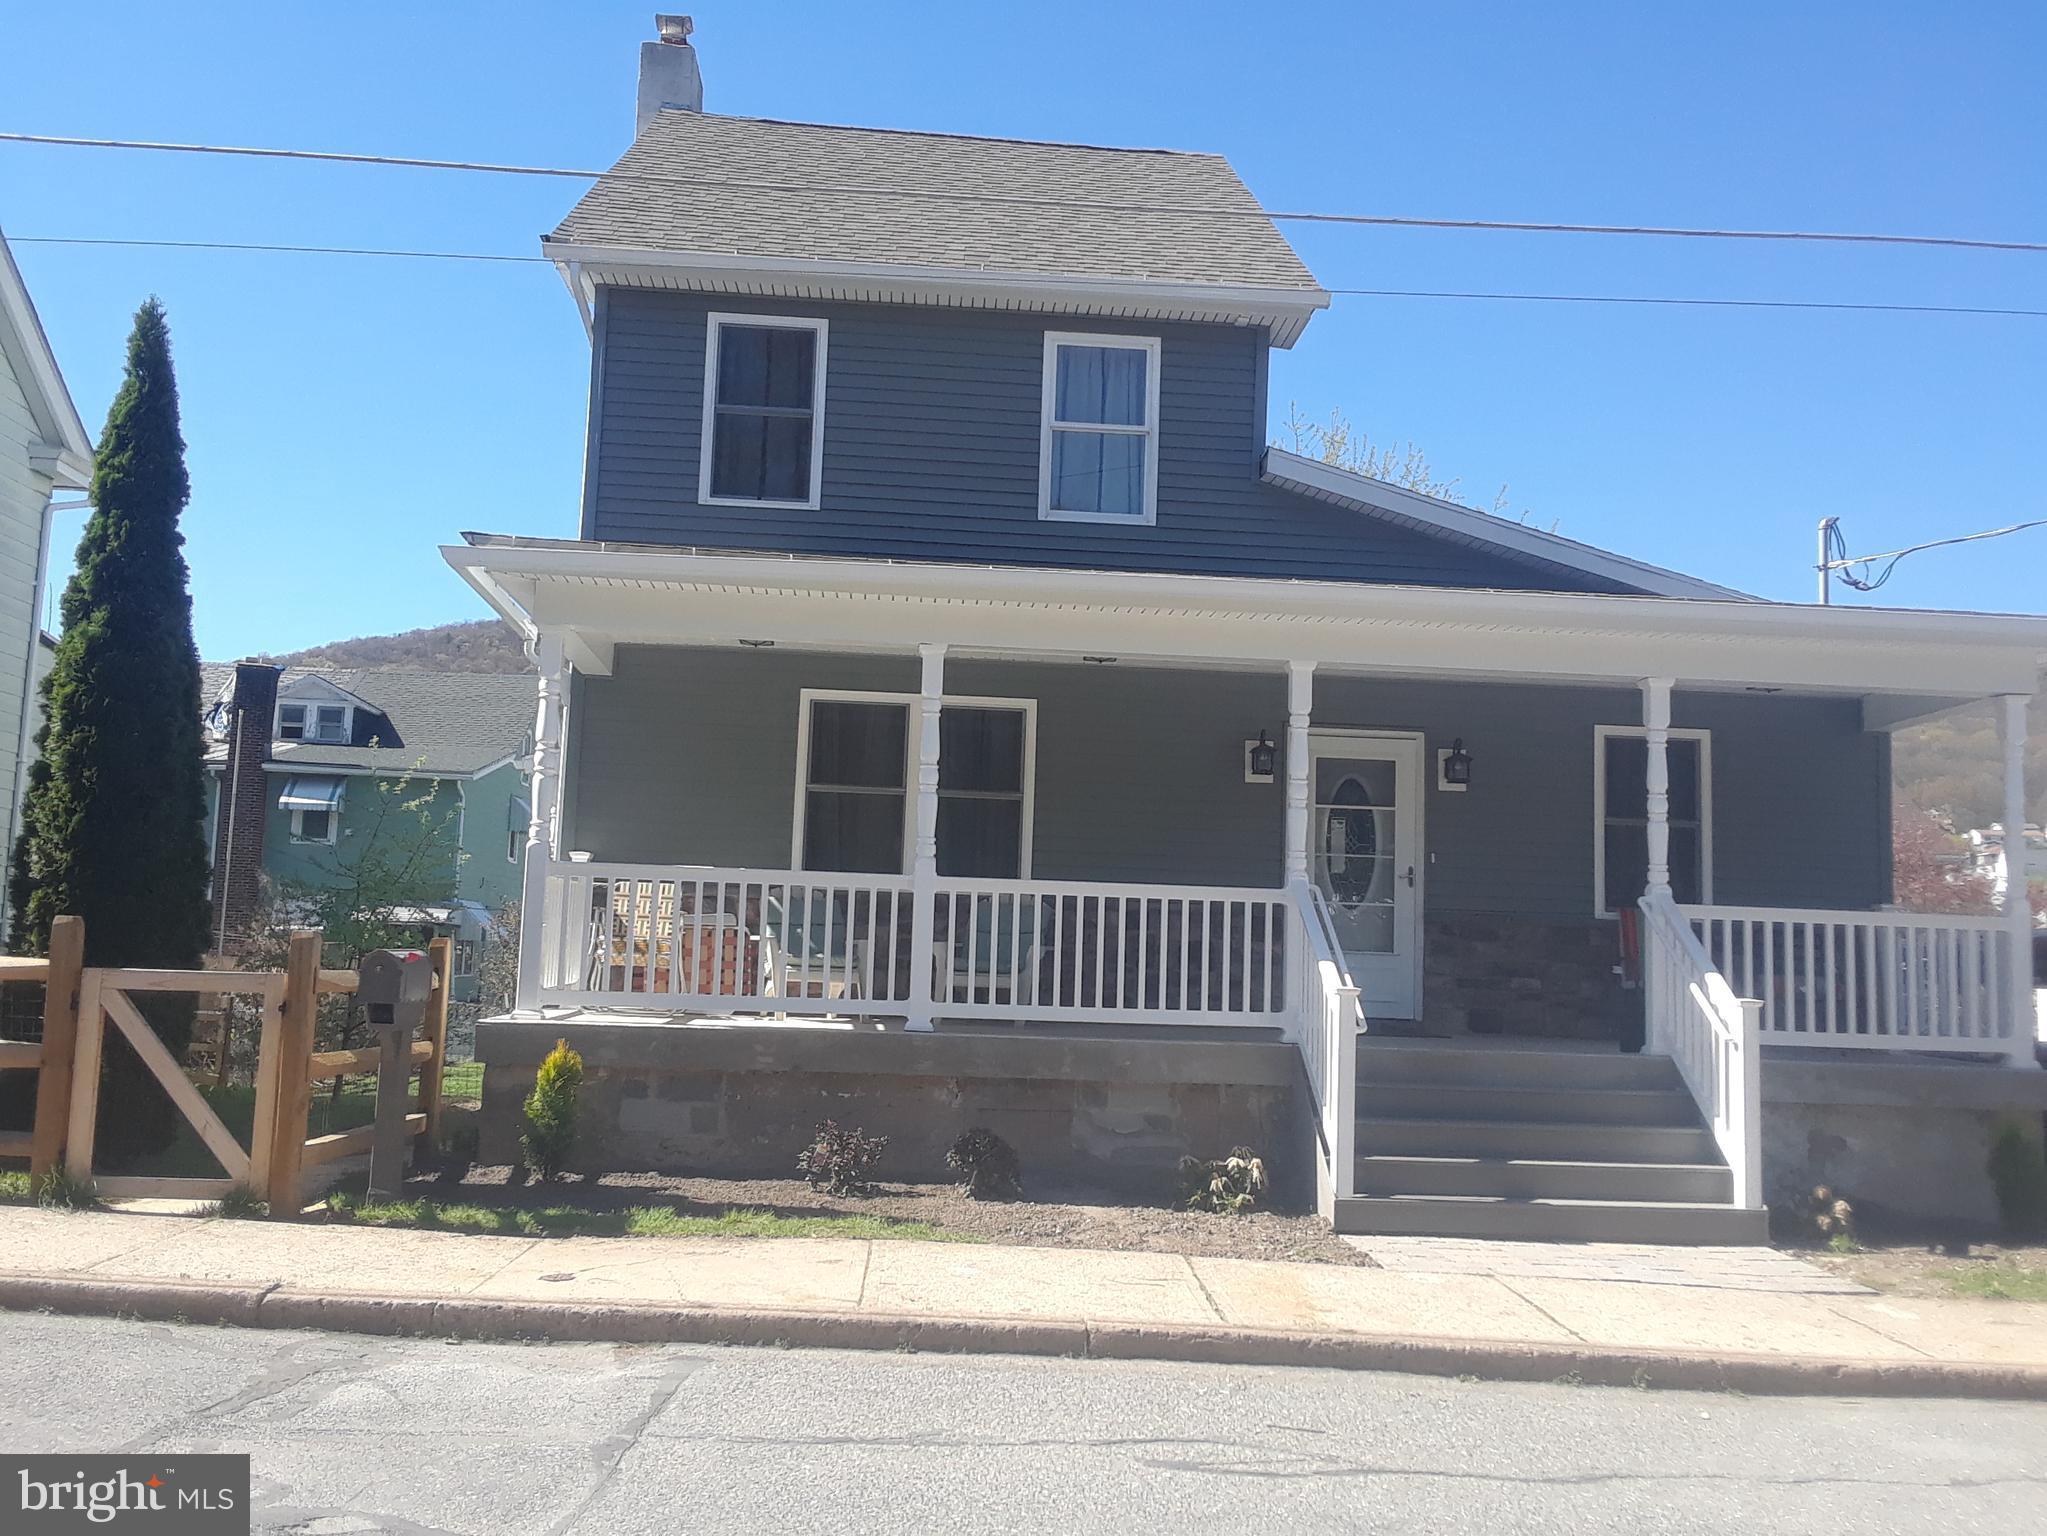 26 COAL STREET, NESQUEHONING, PA 18240